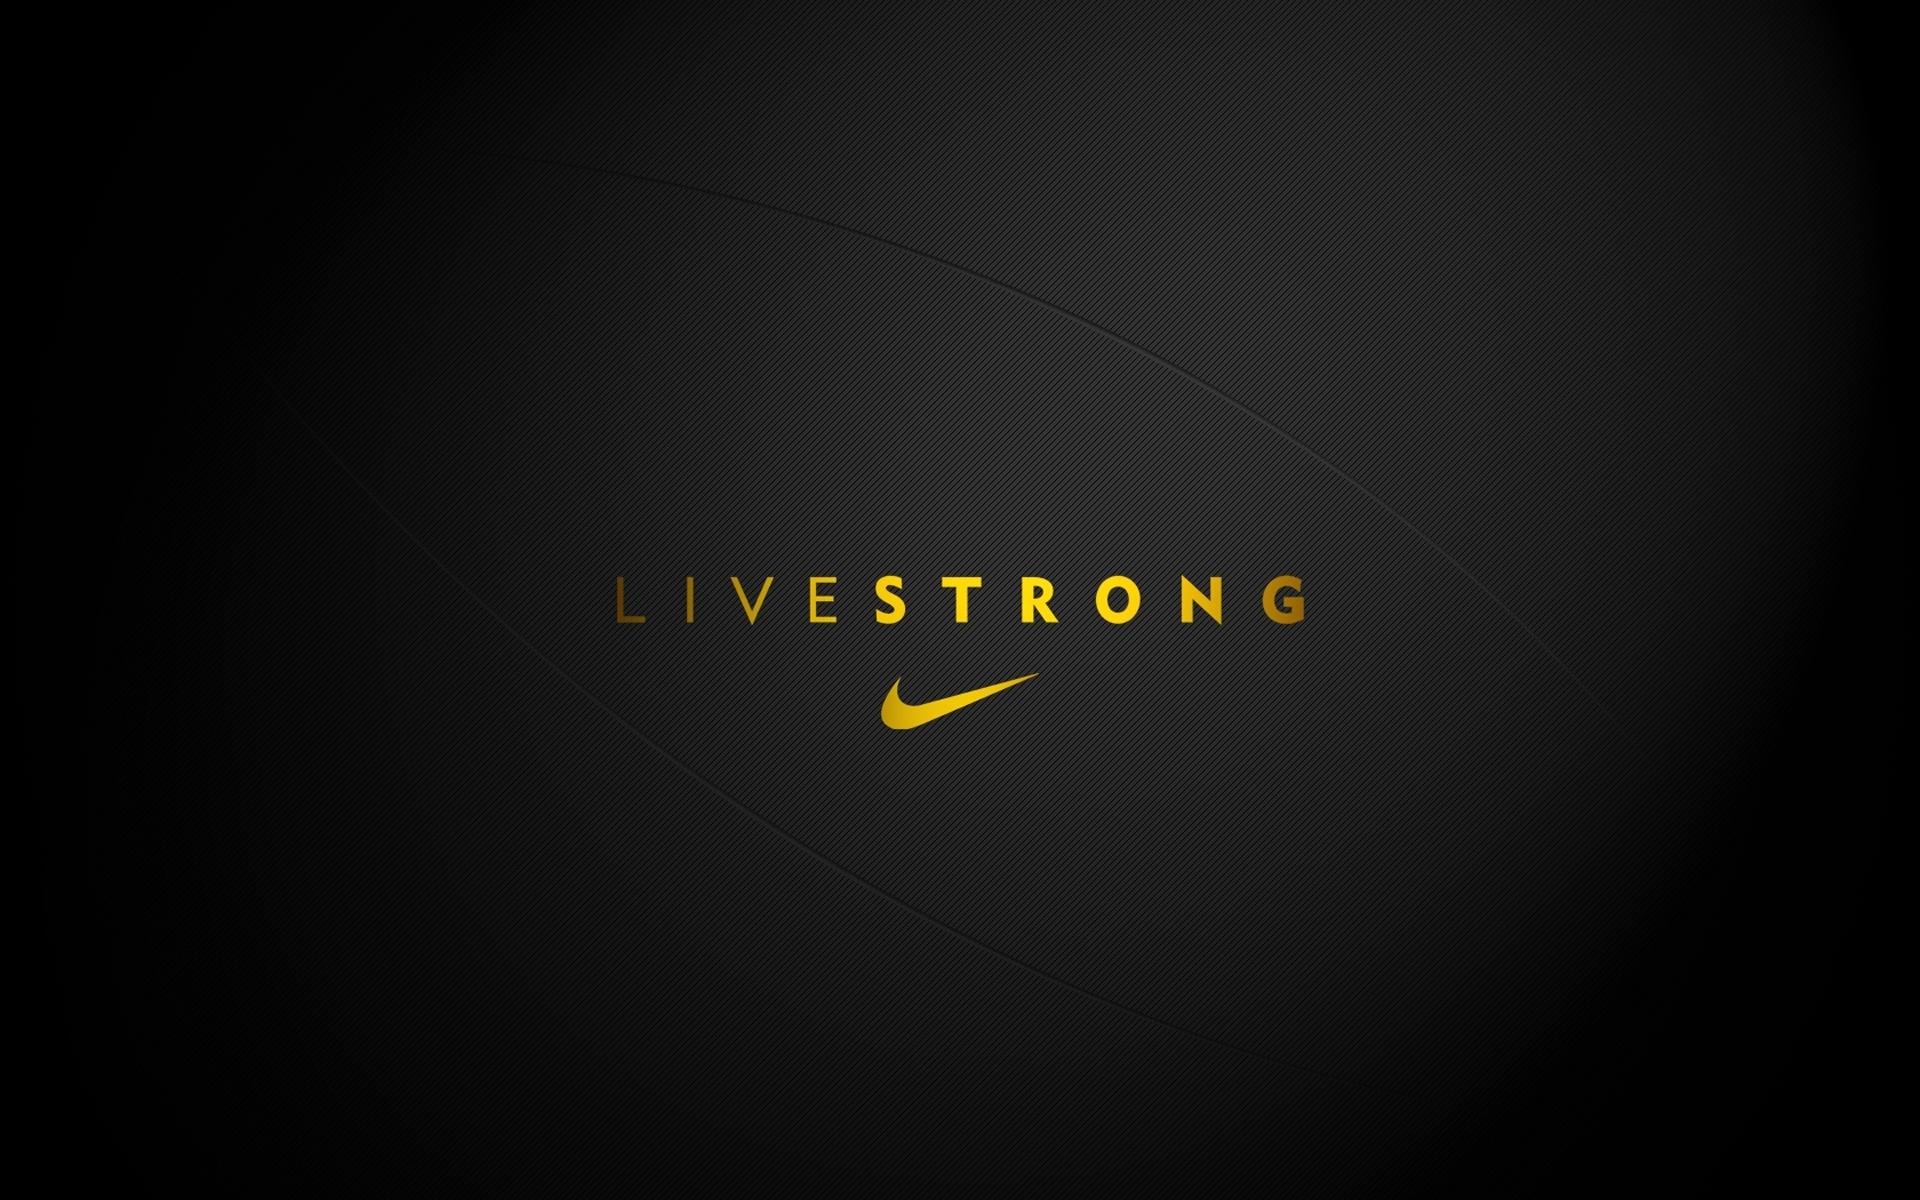 Nike Livestrong Logo Hd Wallpaper